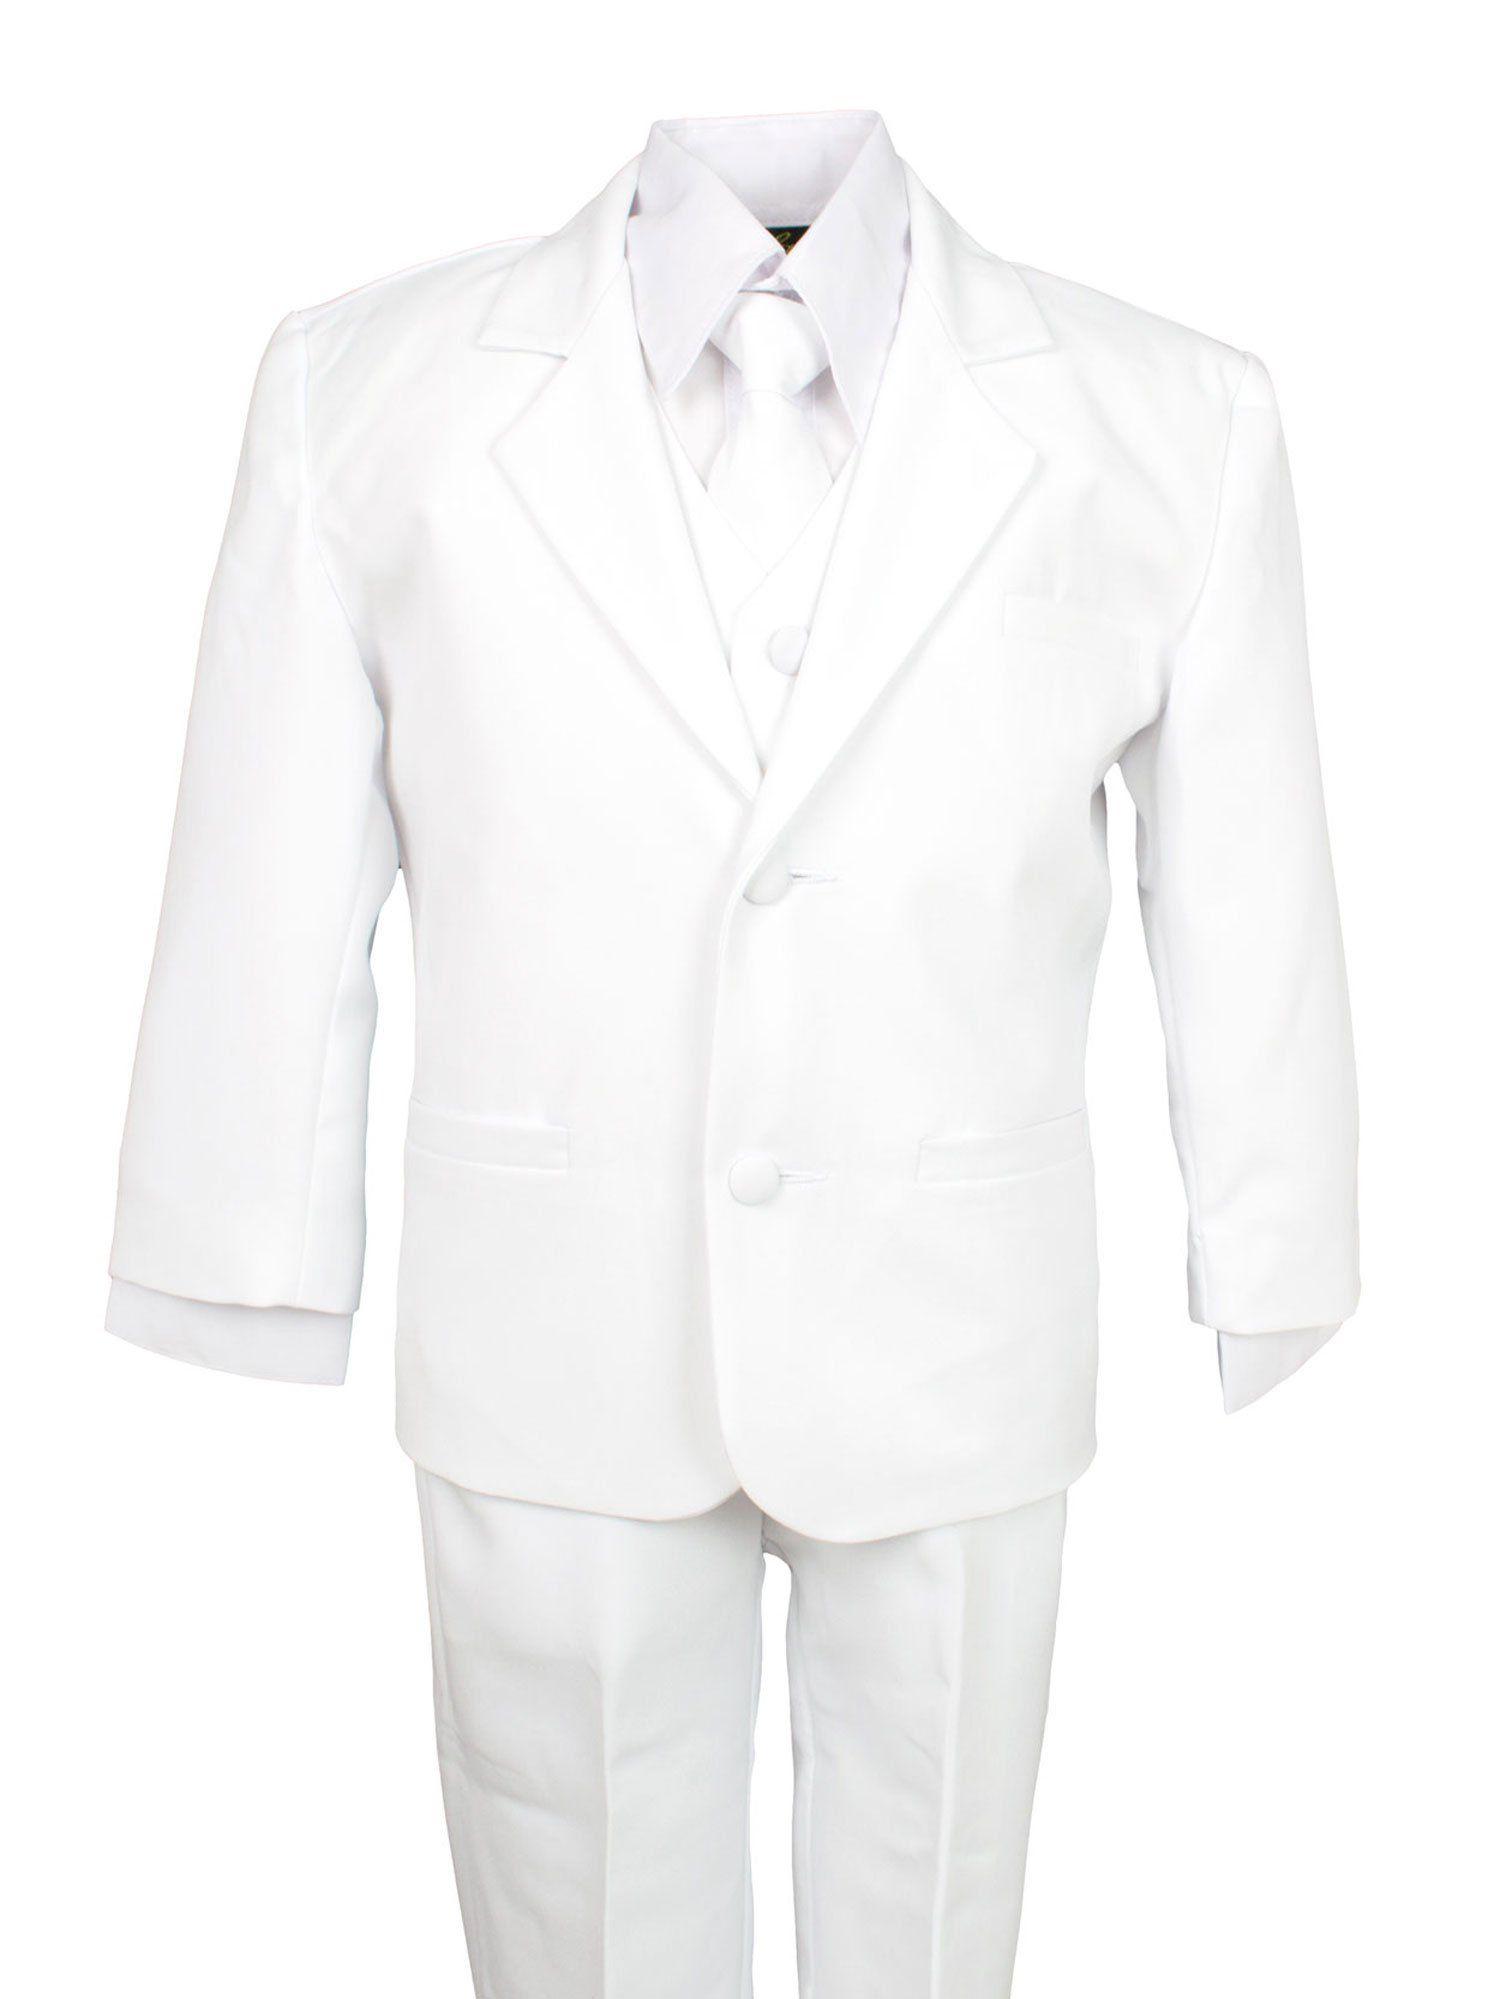 Spring Notion Baby Boys Formal White Dress Suit Set